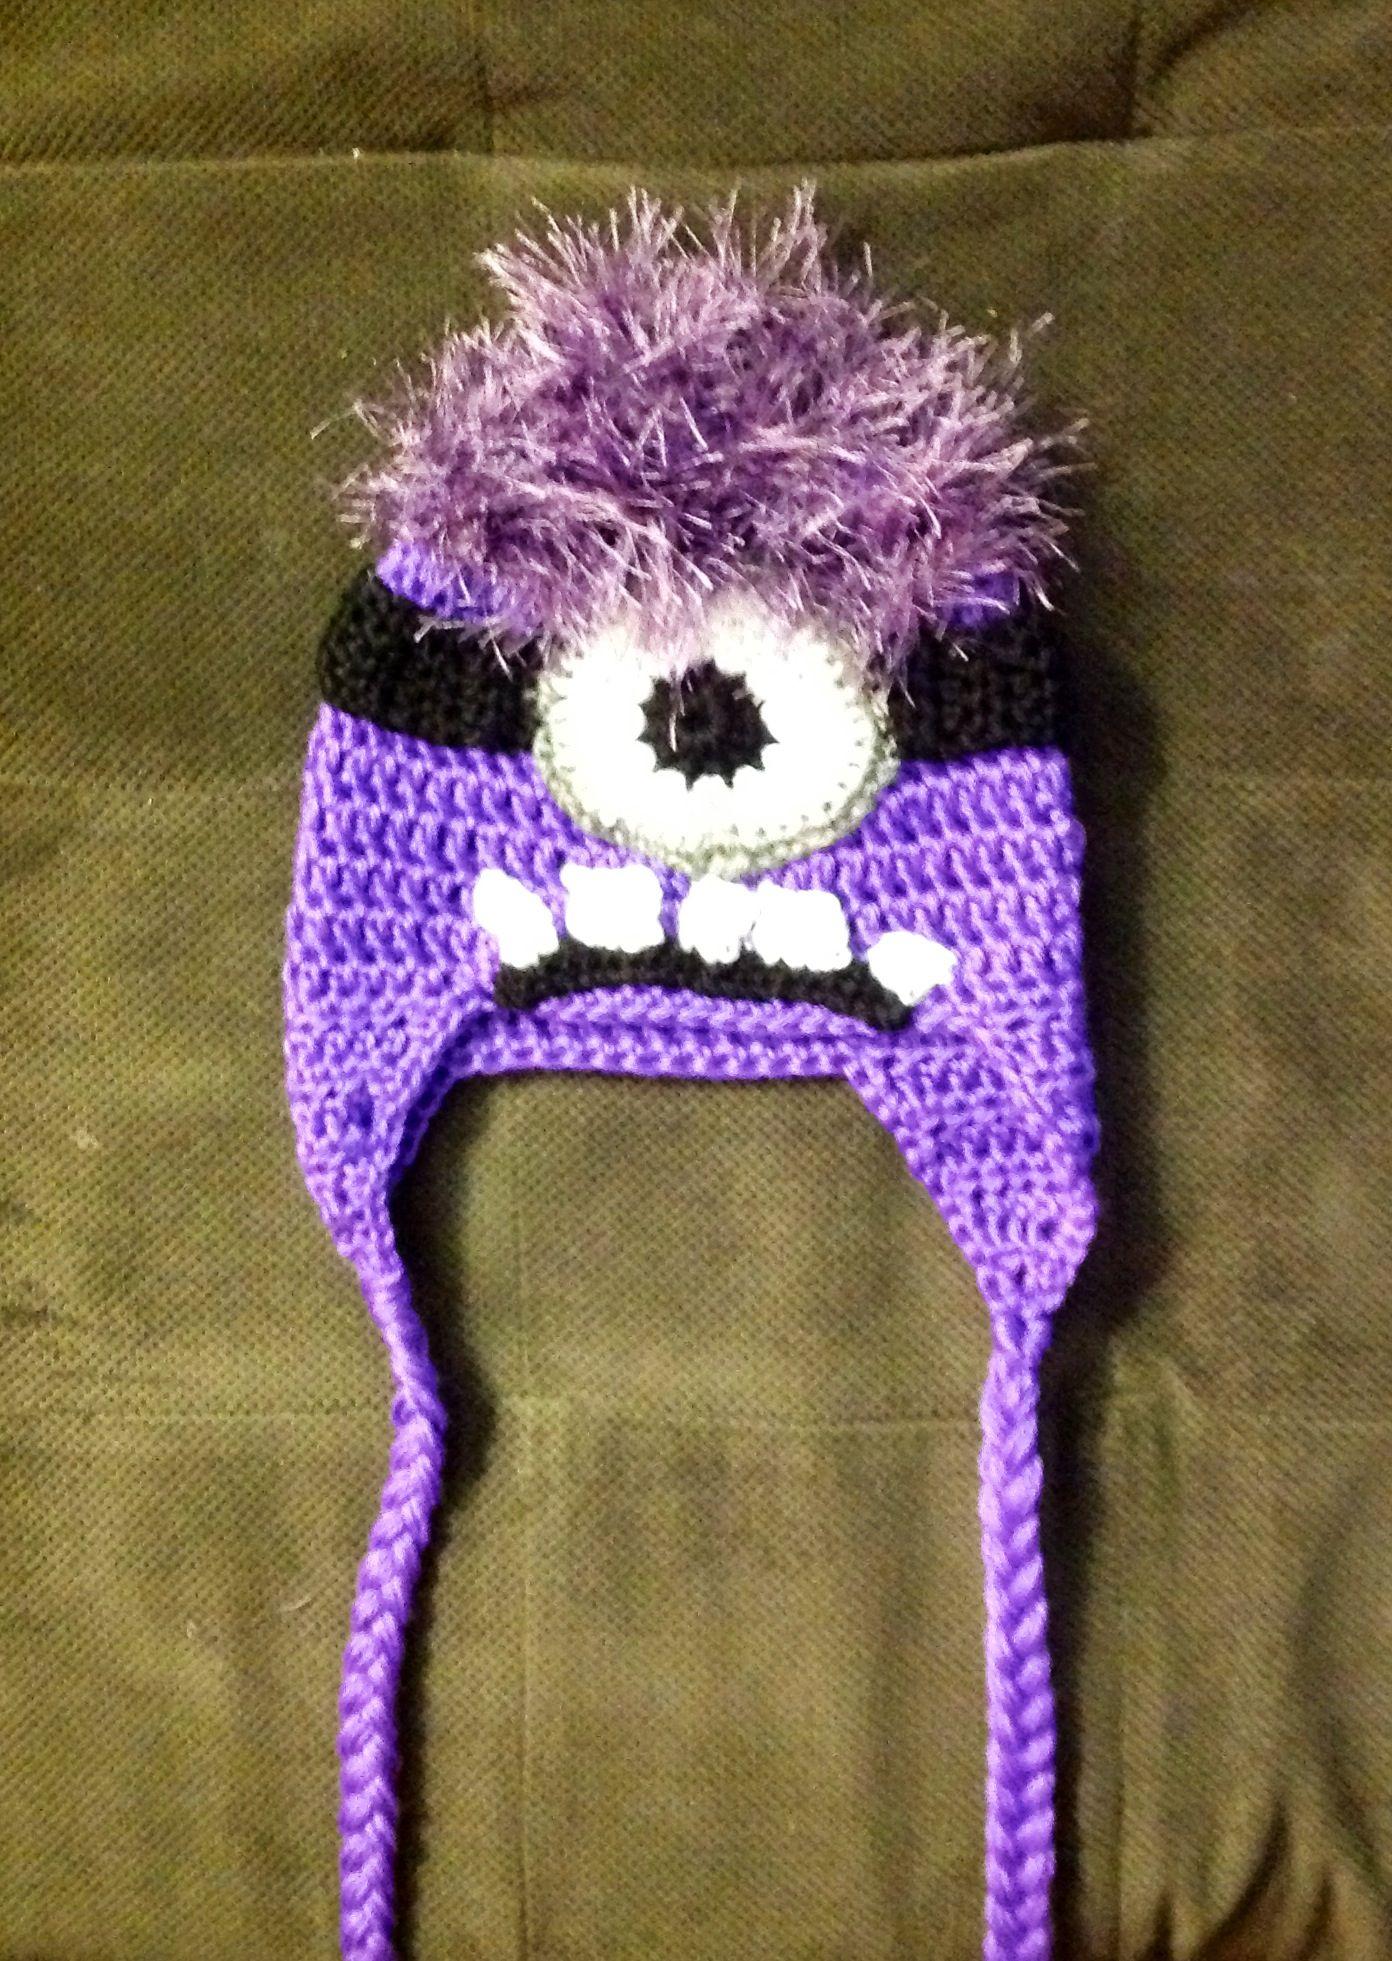 Crochet evil minion hat crochet wearables ive created crochet evil minion hat bankloansurffo Image collections